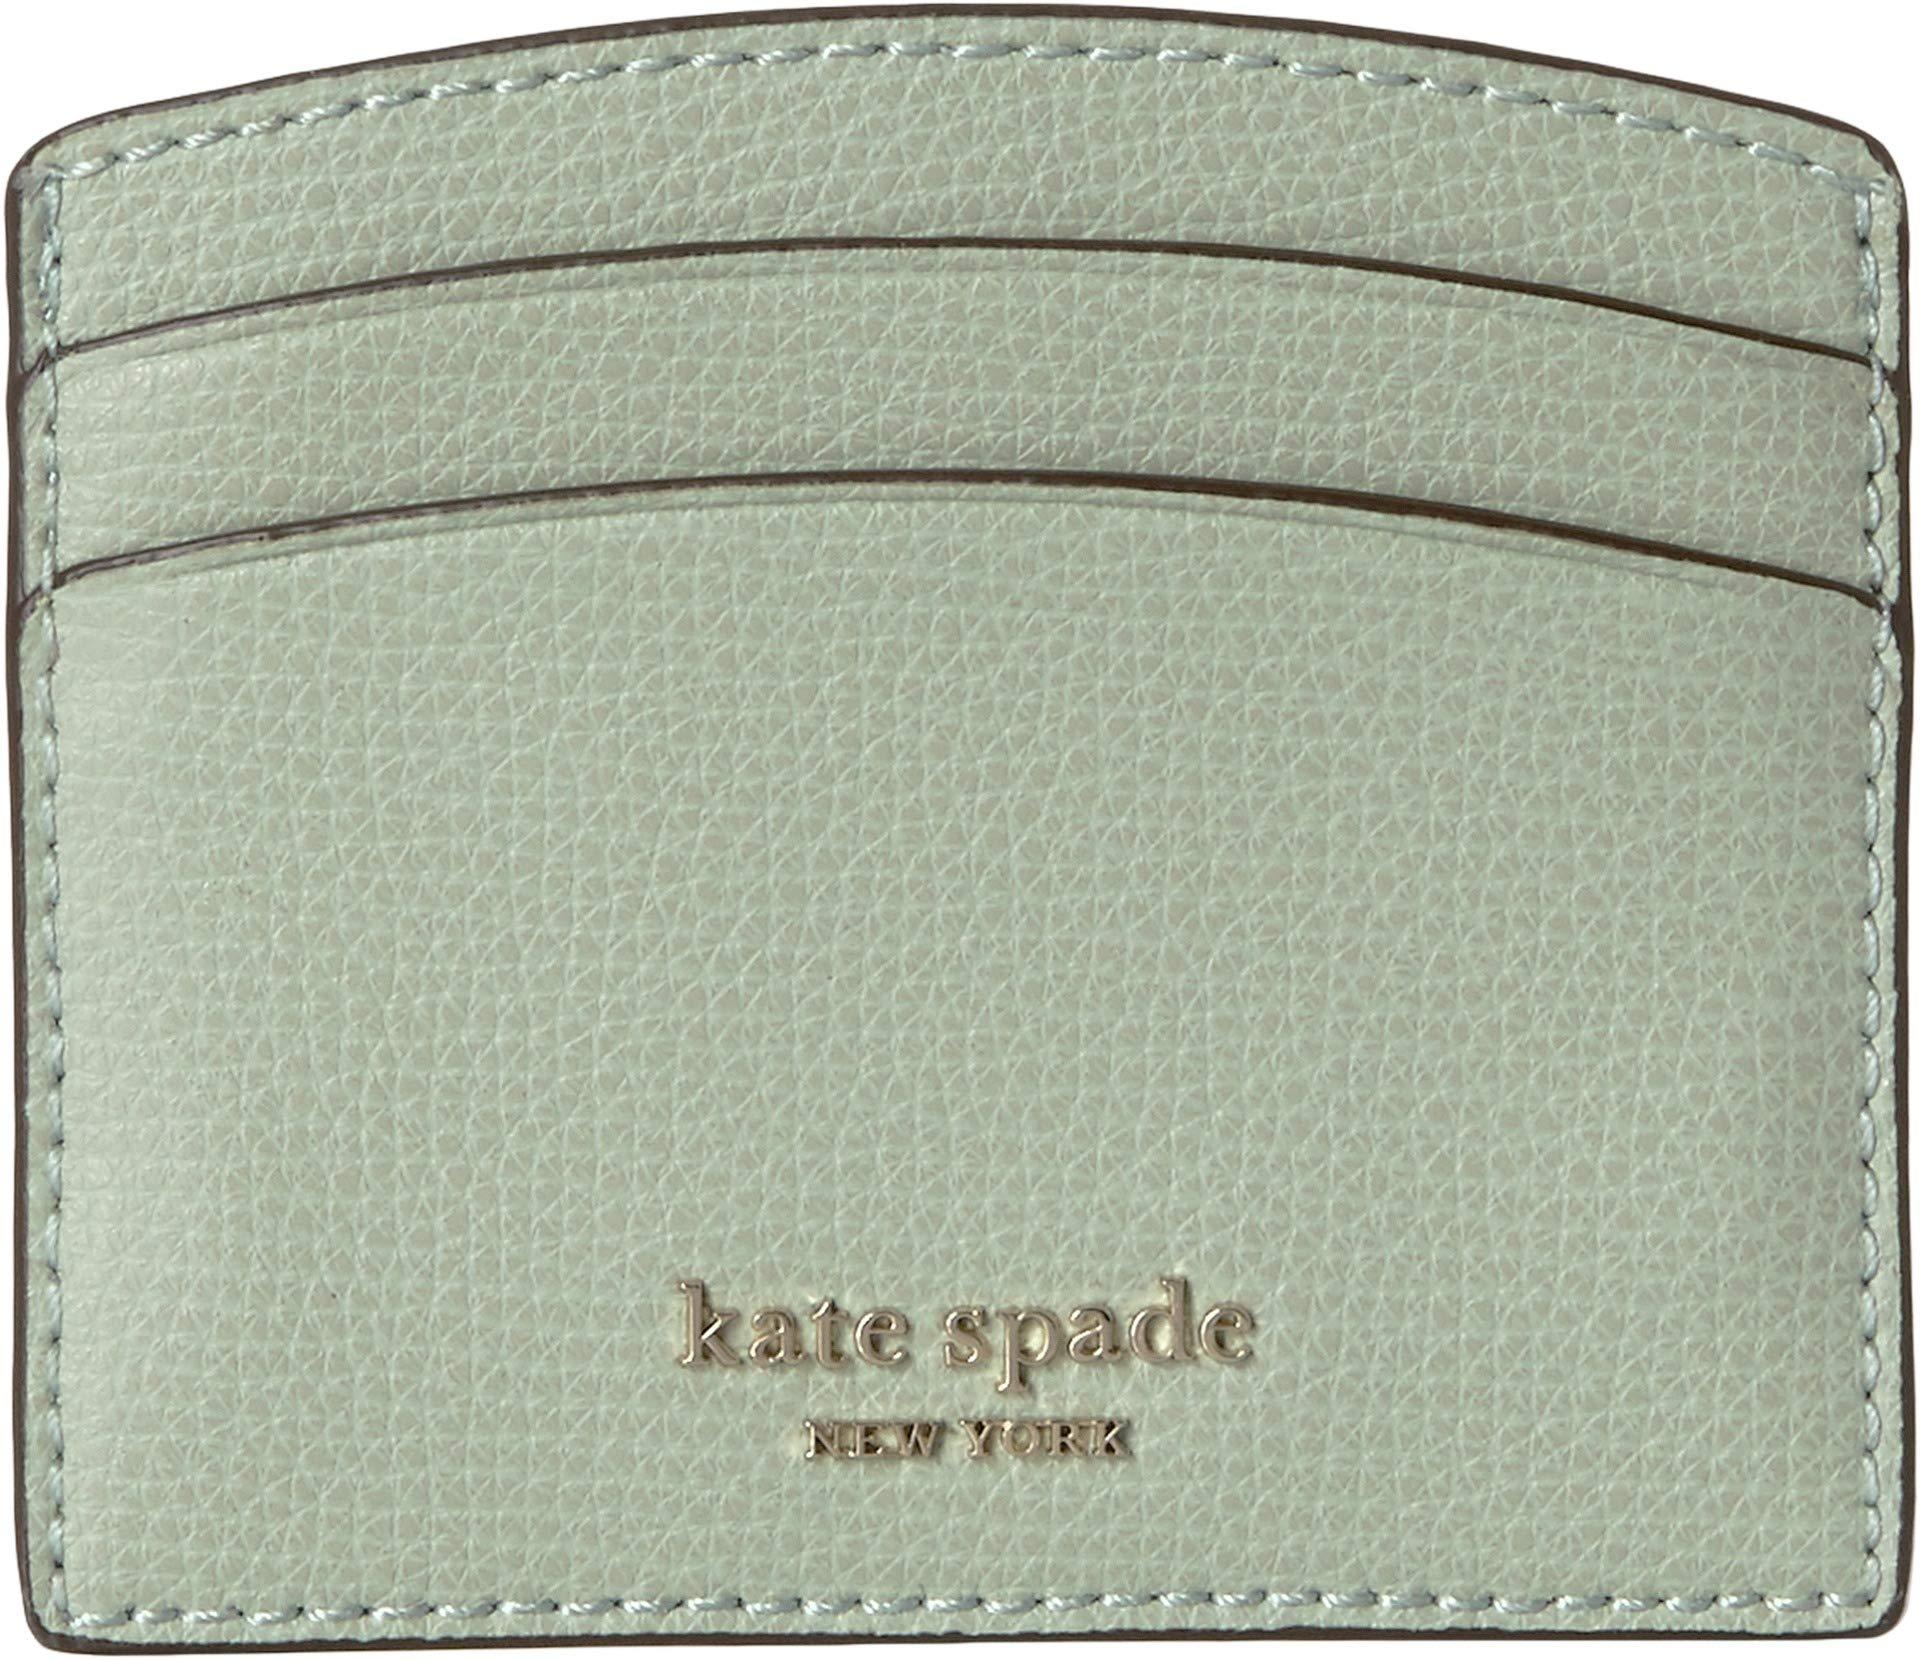 Kate Spade New York Women's Sylvia Card Holder, Light Pistachio, Green, One Size